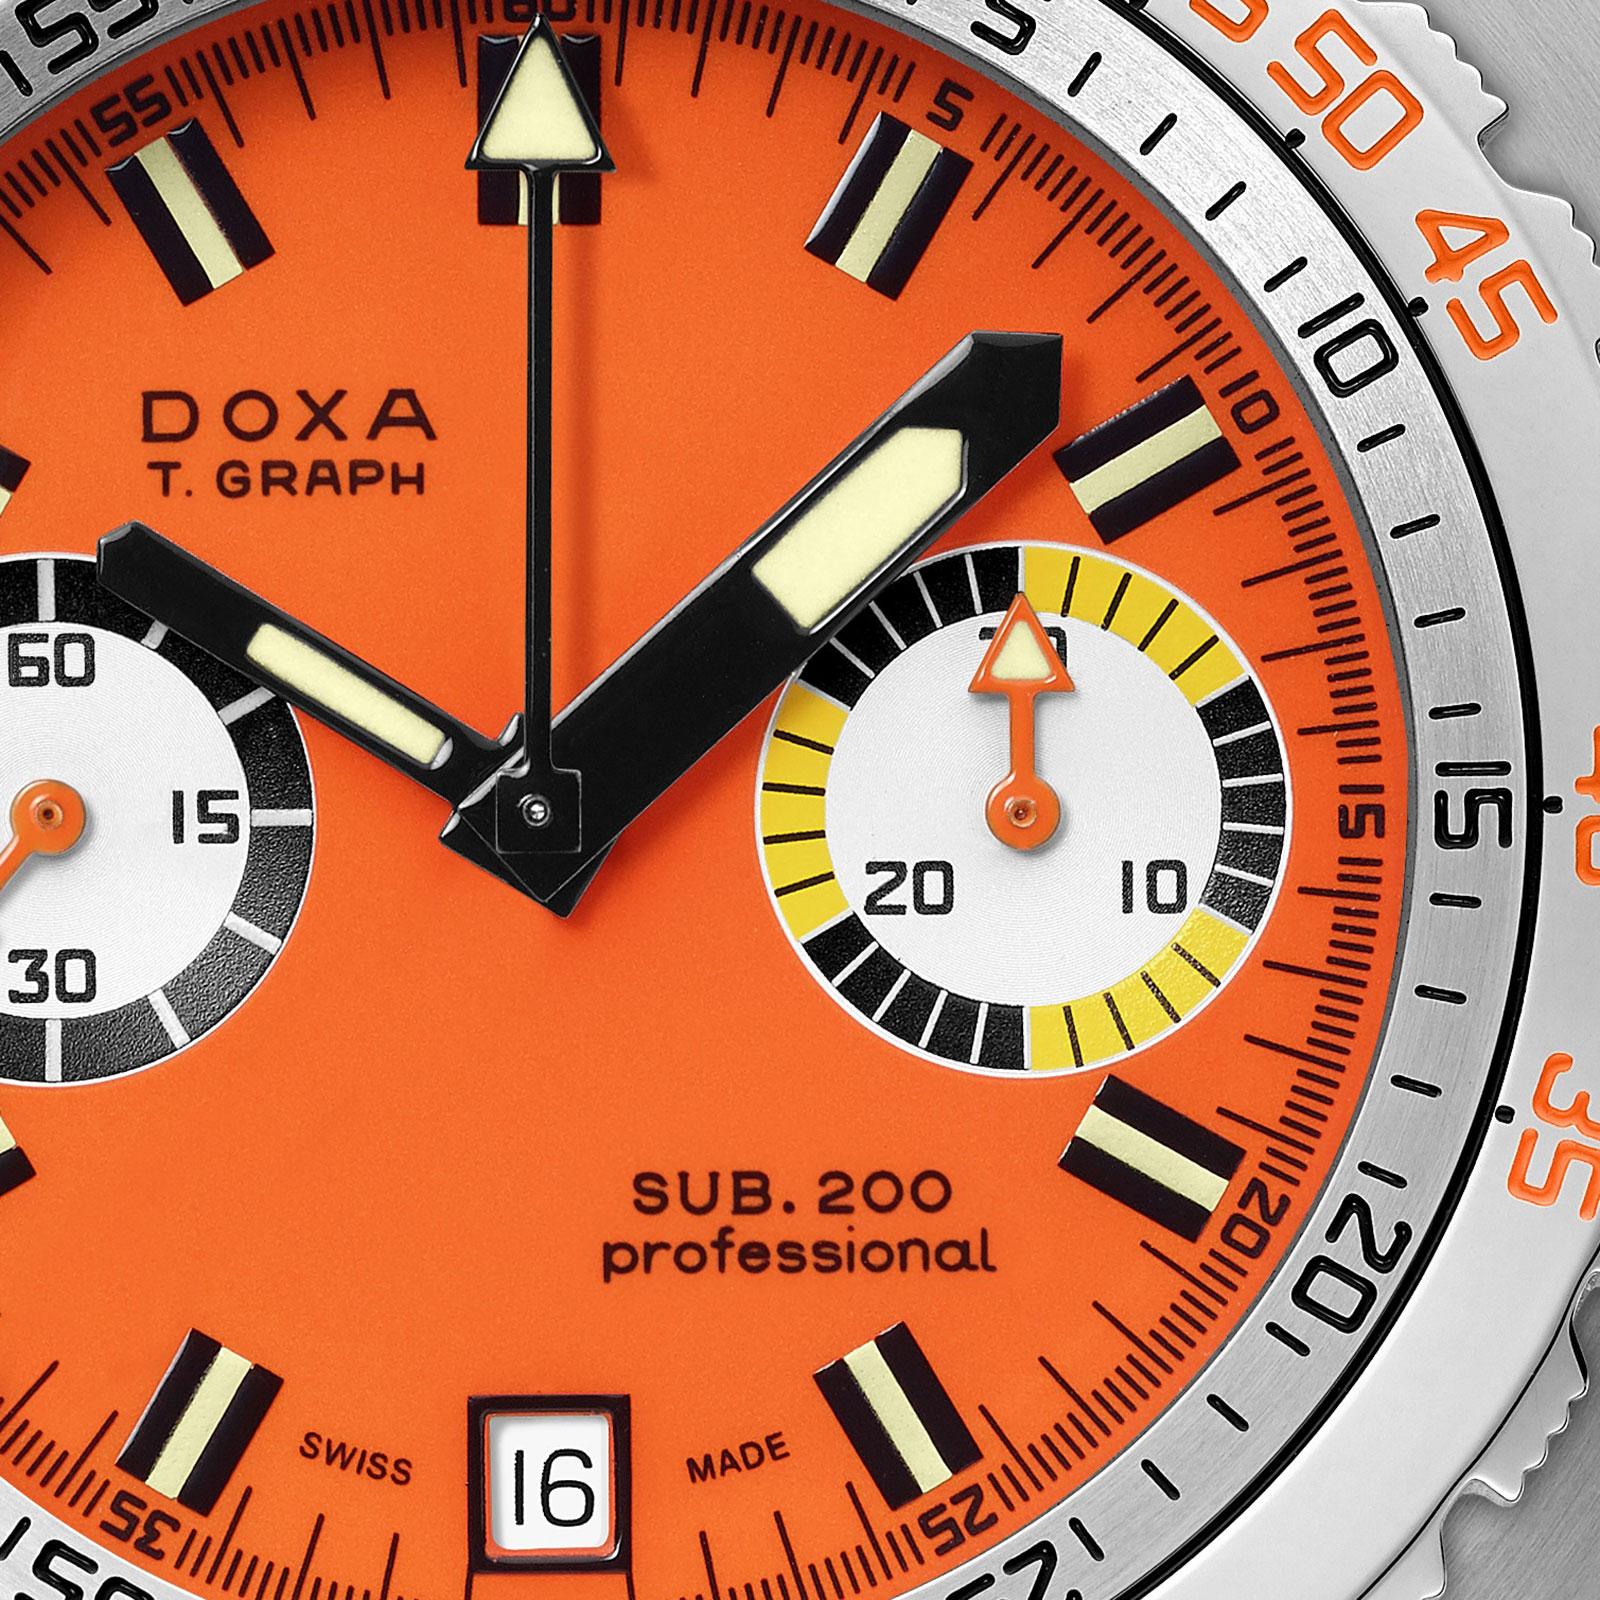 doxa Sub 200 T.Graph steel chronograph 4